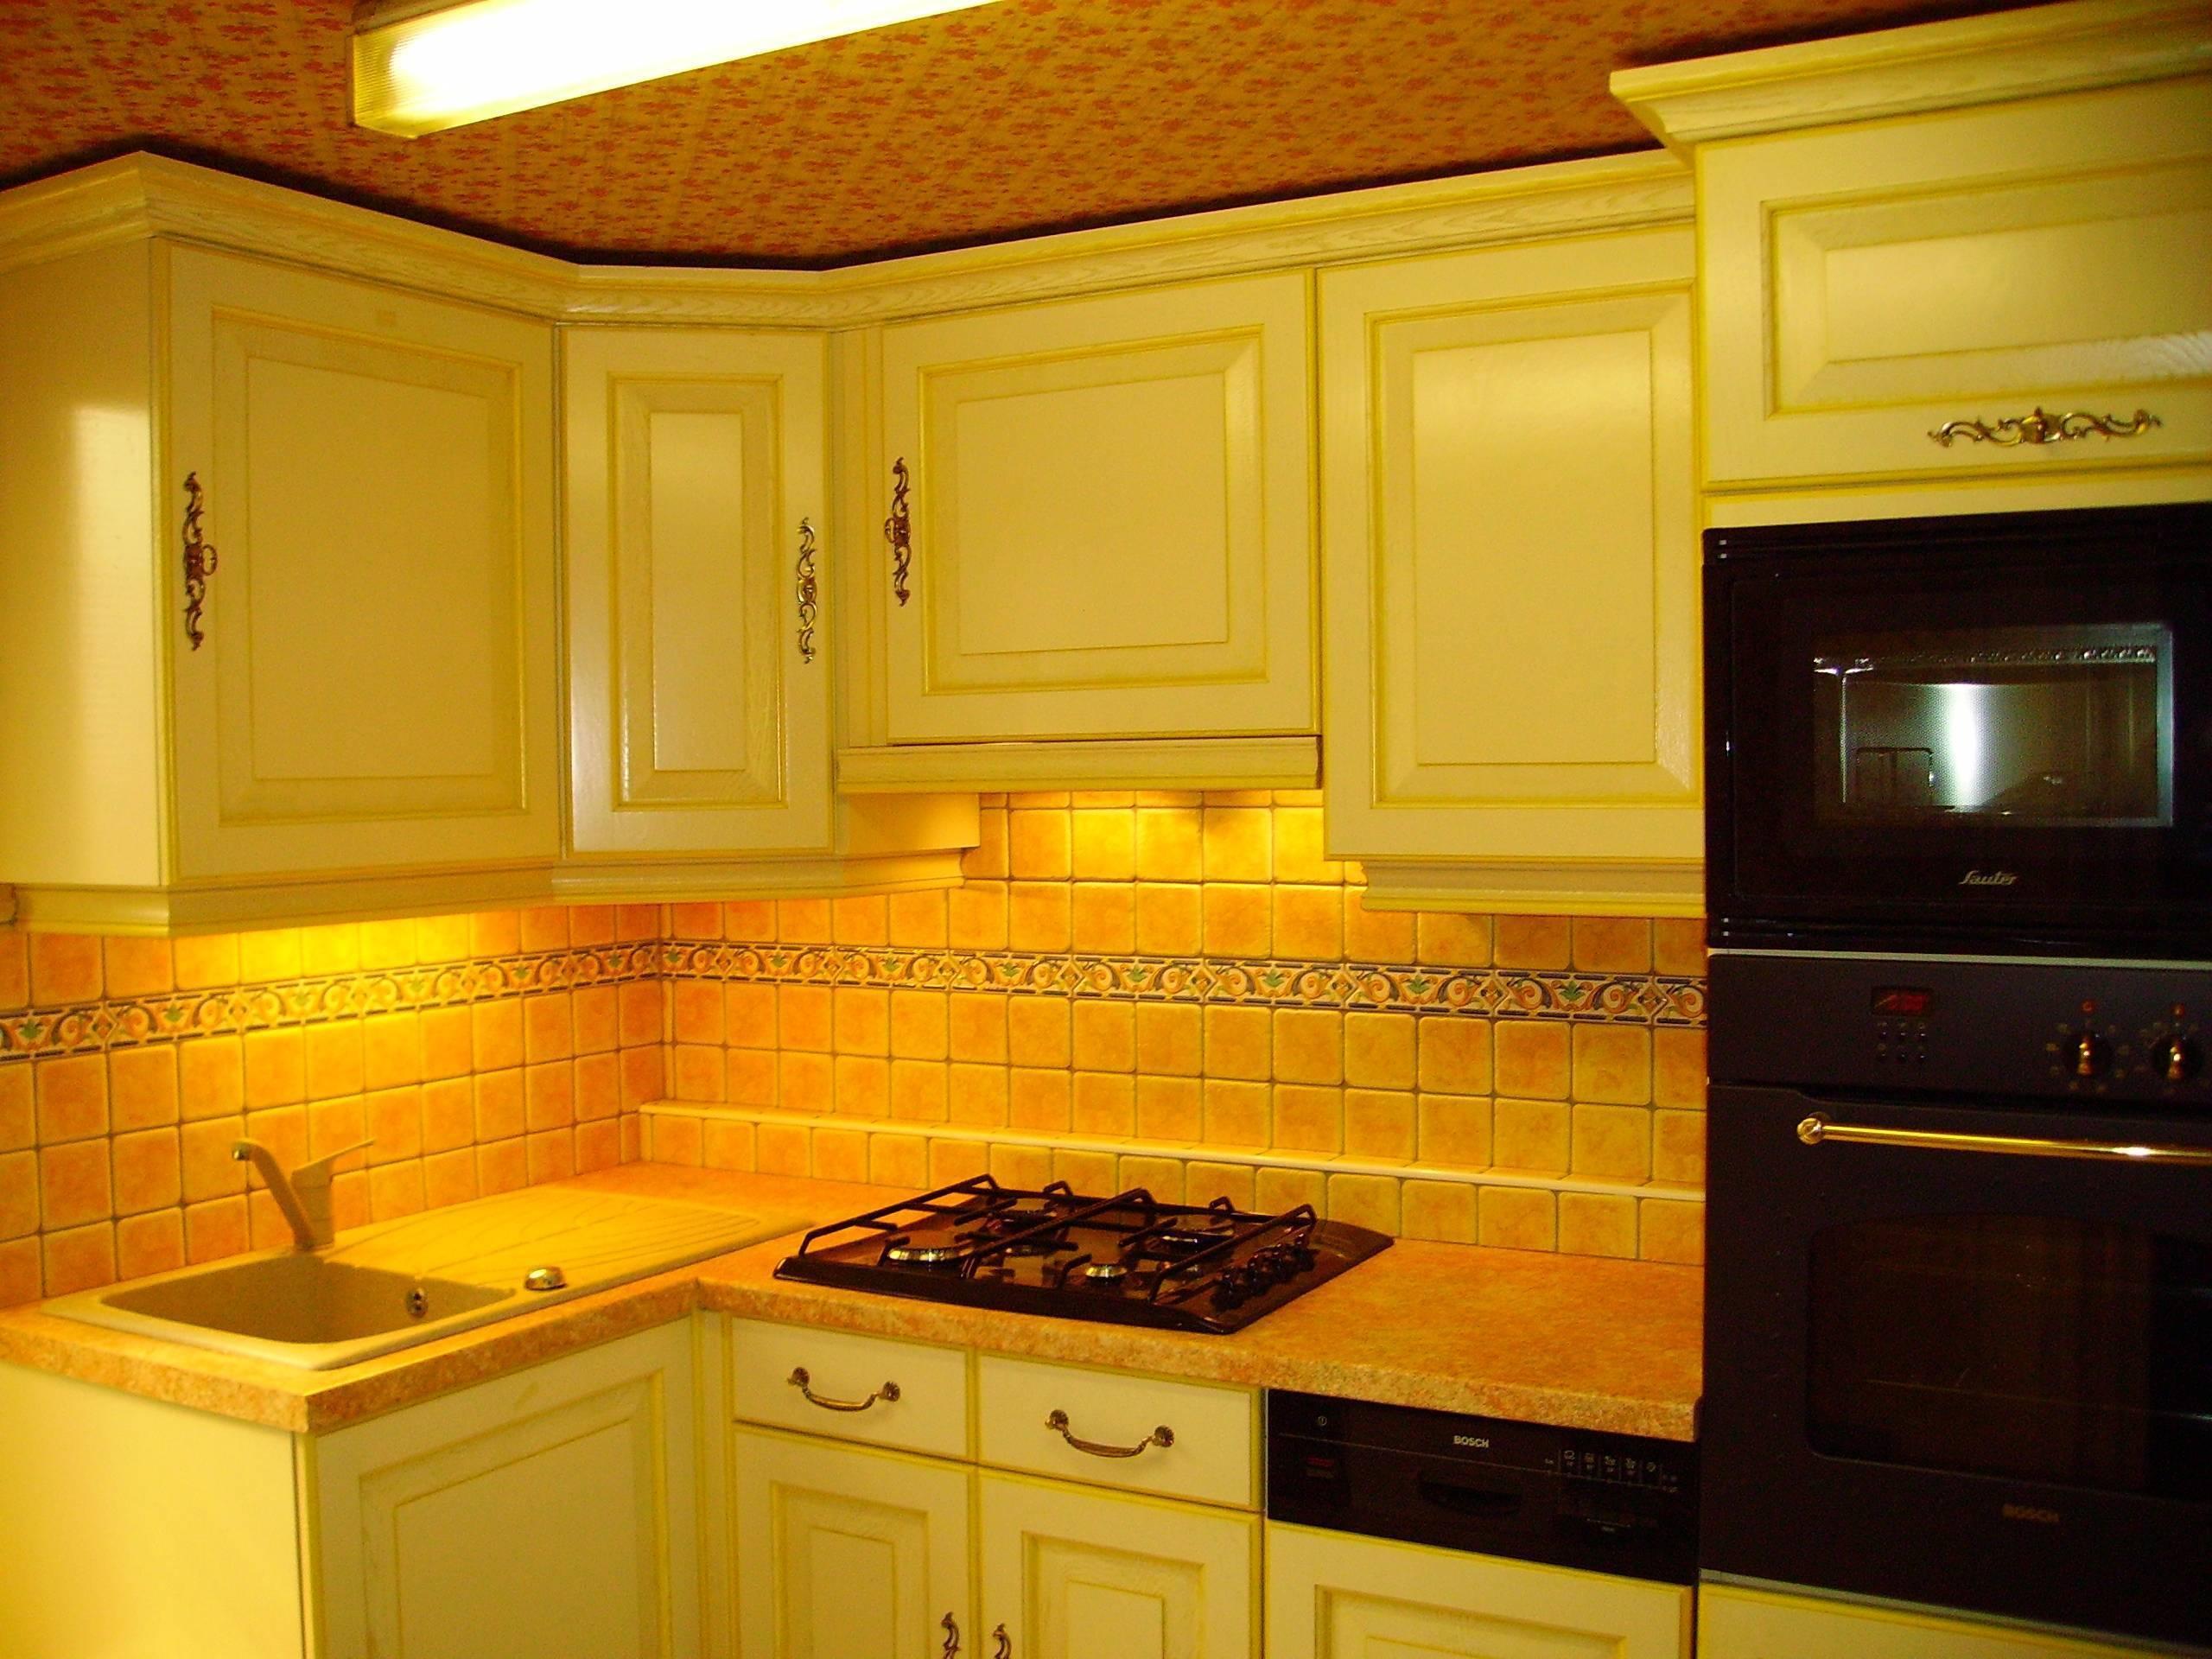 Salle De Bain Equipee ~ galerie photos salle de bains et cuisine quip es dcb